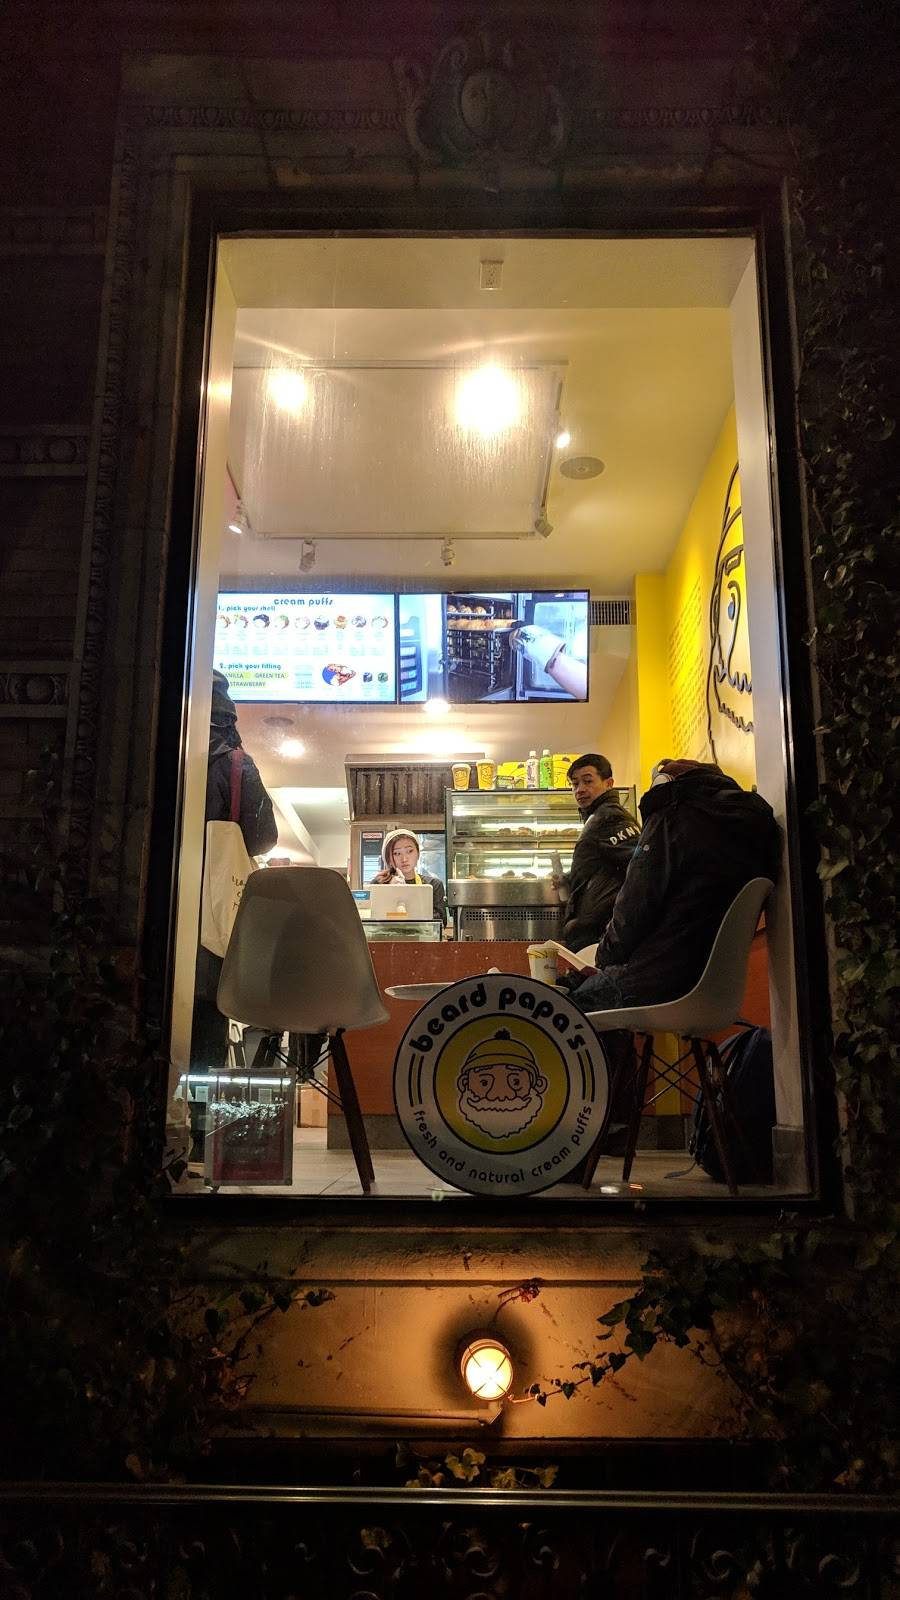 Beard Papa's Desserts   cafe   239 E 53rd St, New York, NY 10022, USA   2129356308 OR +1 212-935-6308